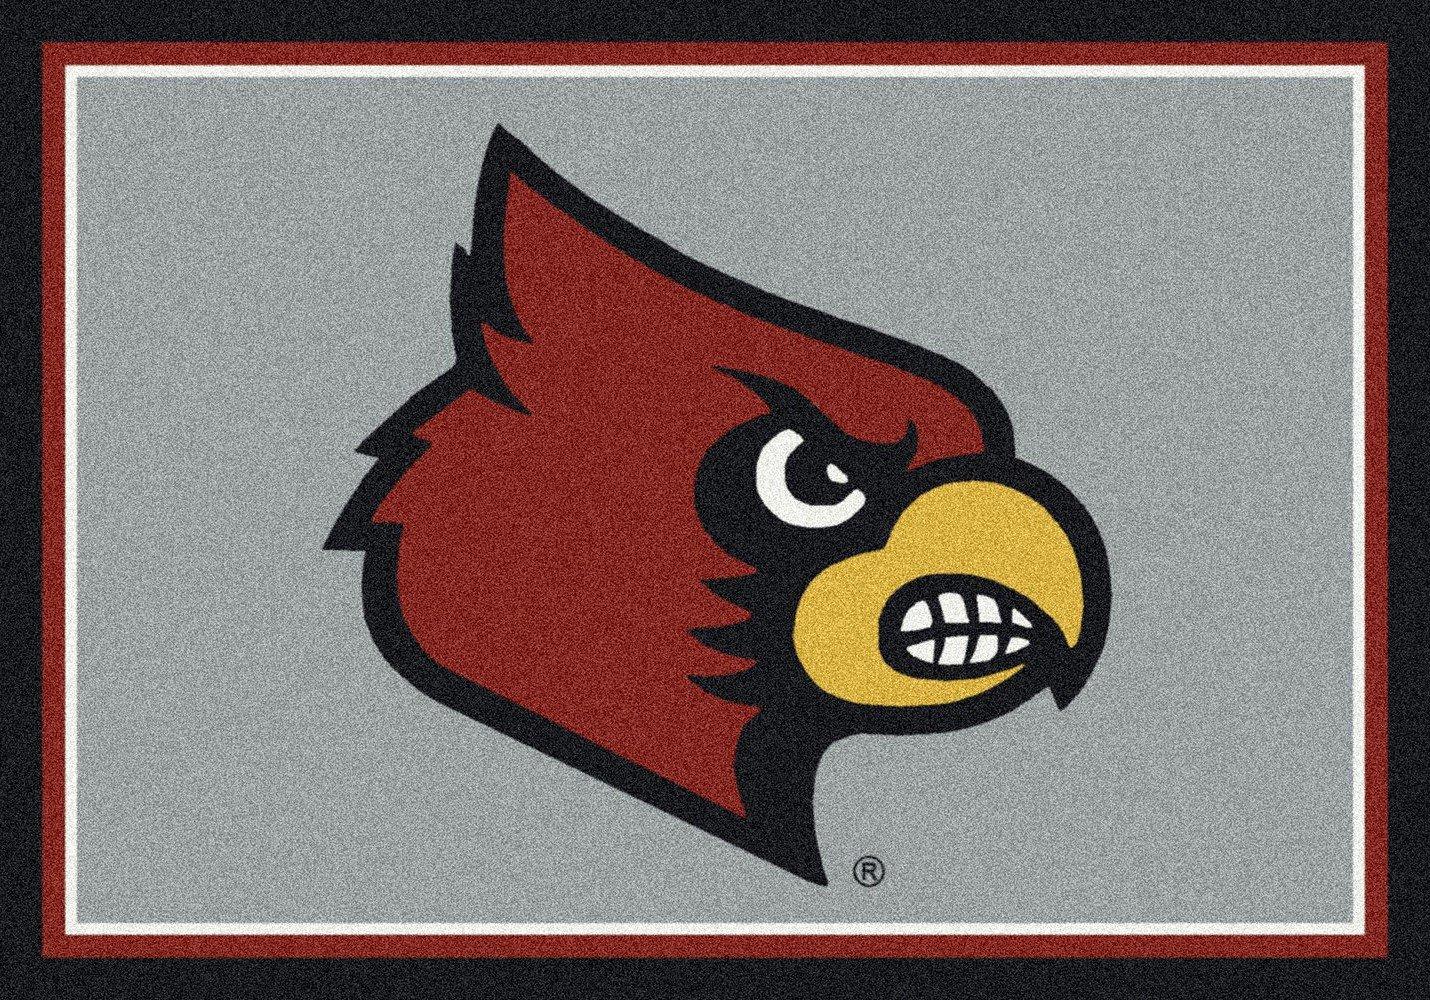 Louisville Cardinals NCAA College Team Spirit Team Area Rug 5'4''x7'8''